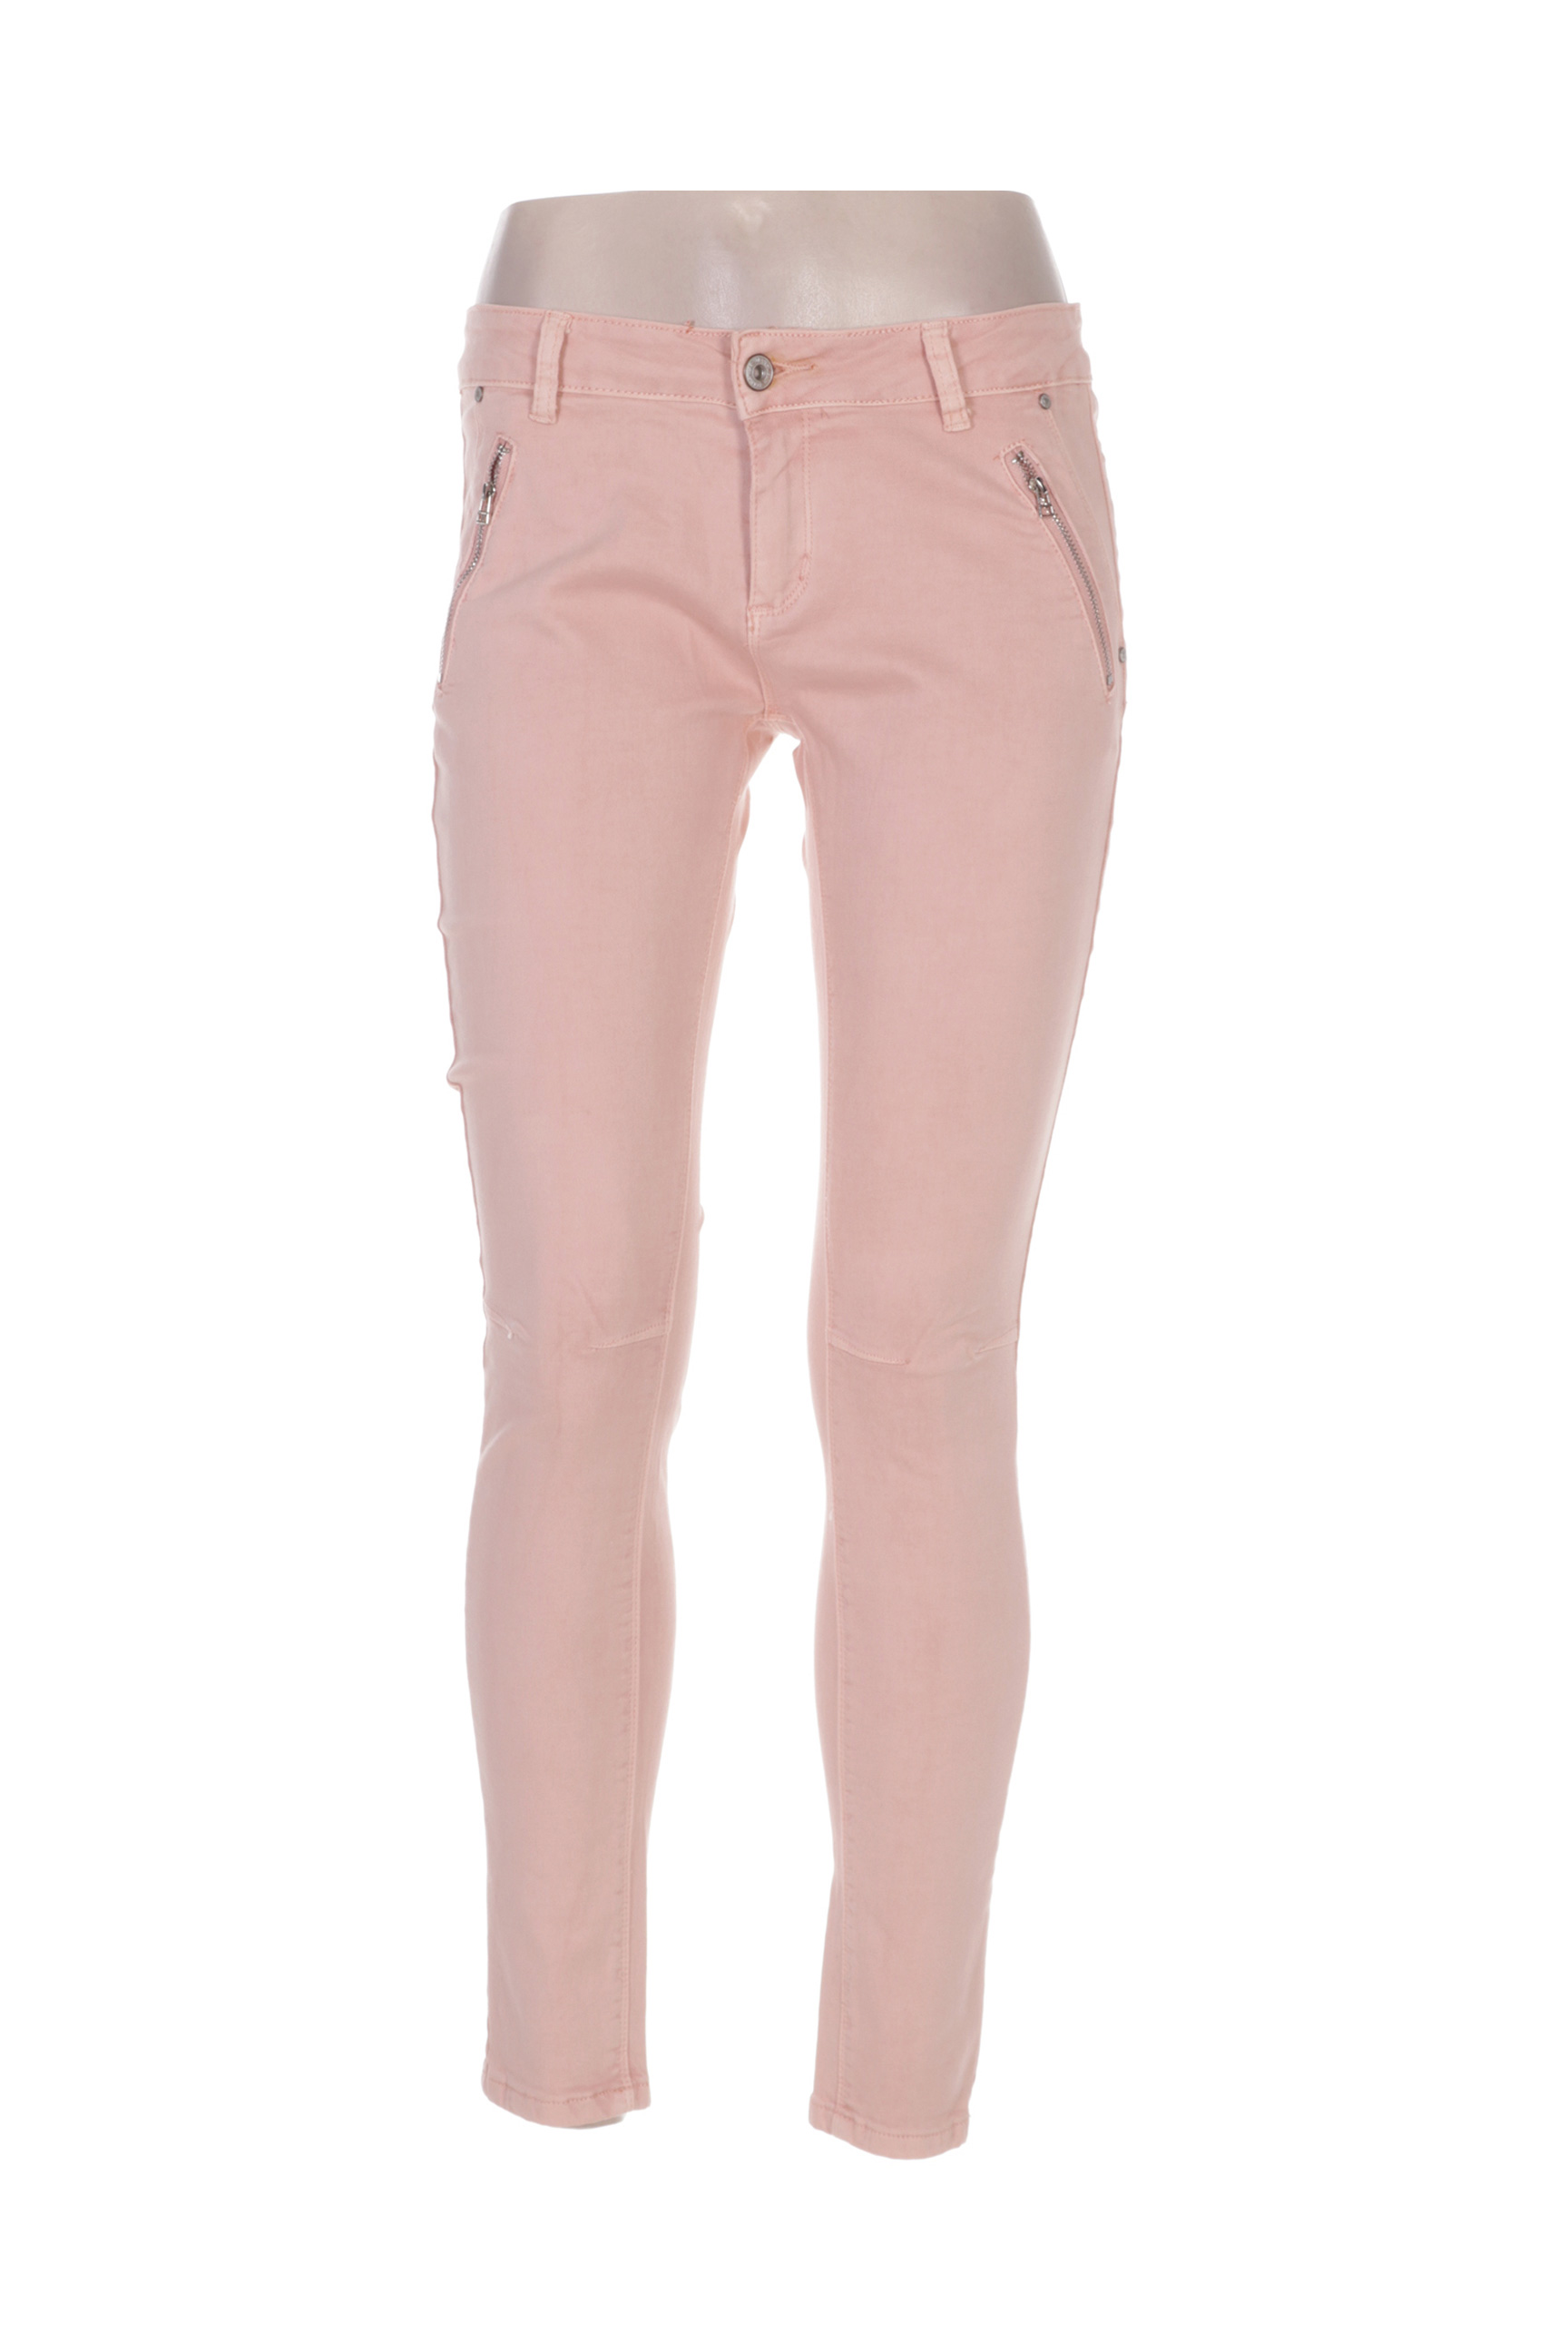 Pantalon 7/8 femme Regular rose taille : 42 14 FR (FR)